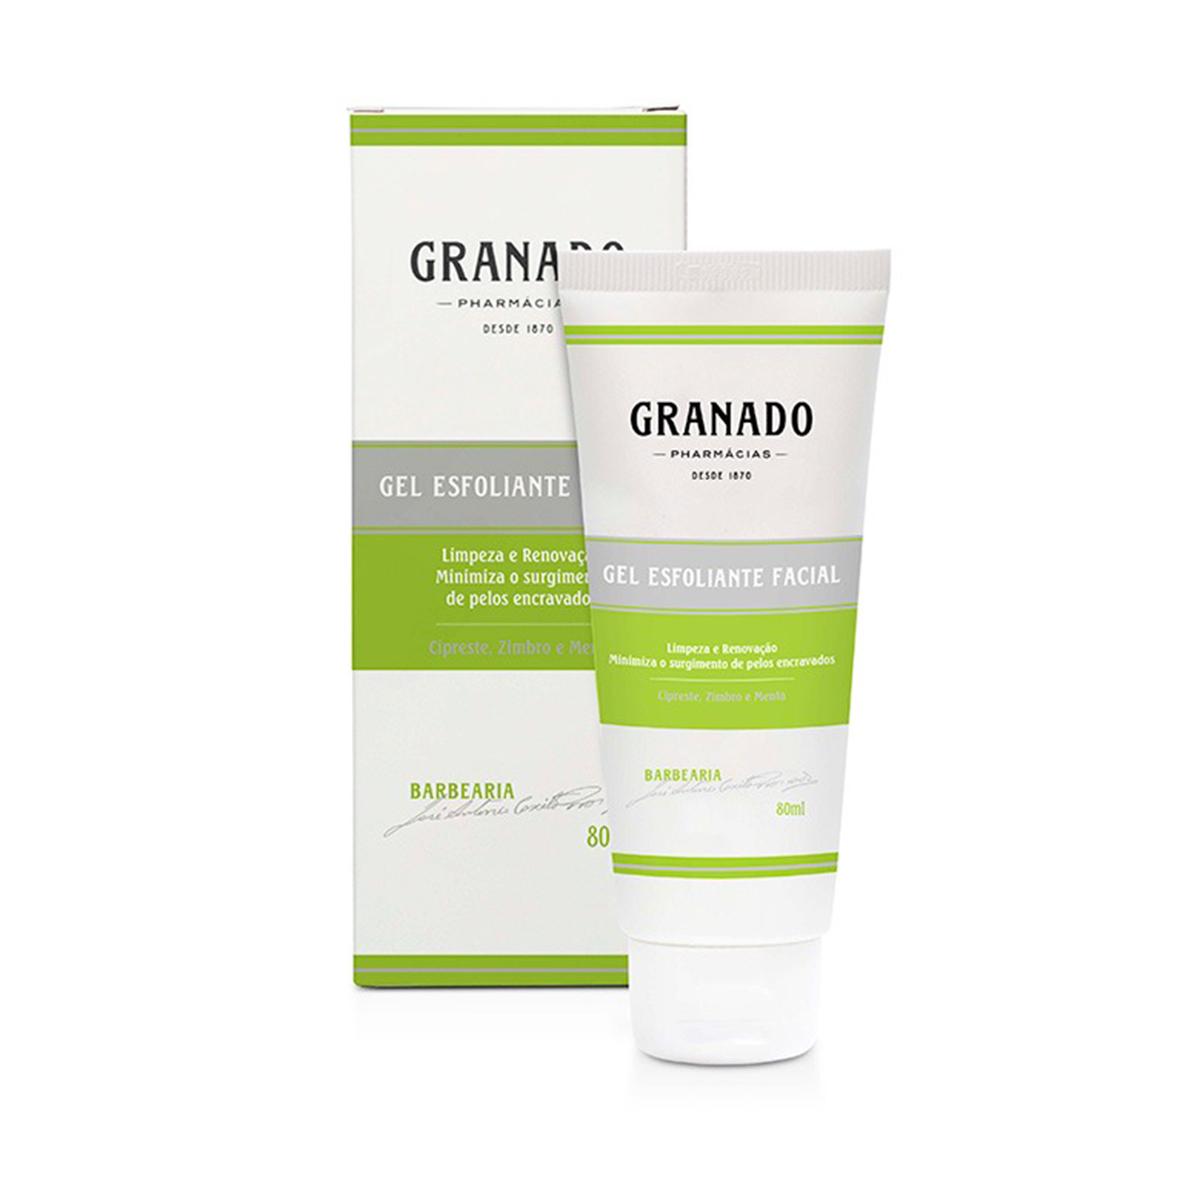 Gel Esfoliante Facial Granado 80ml  - Lemis